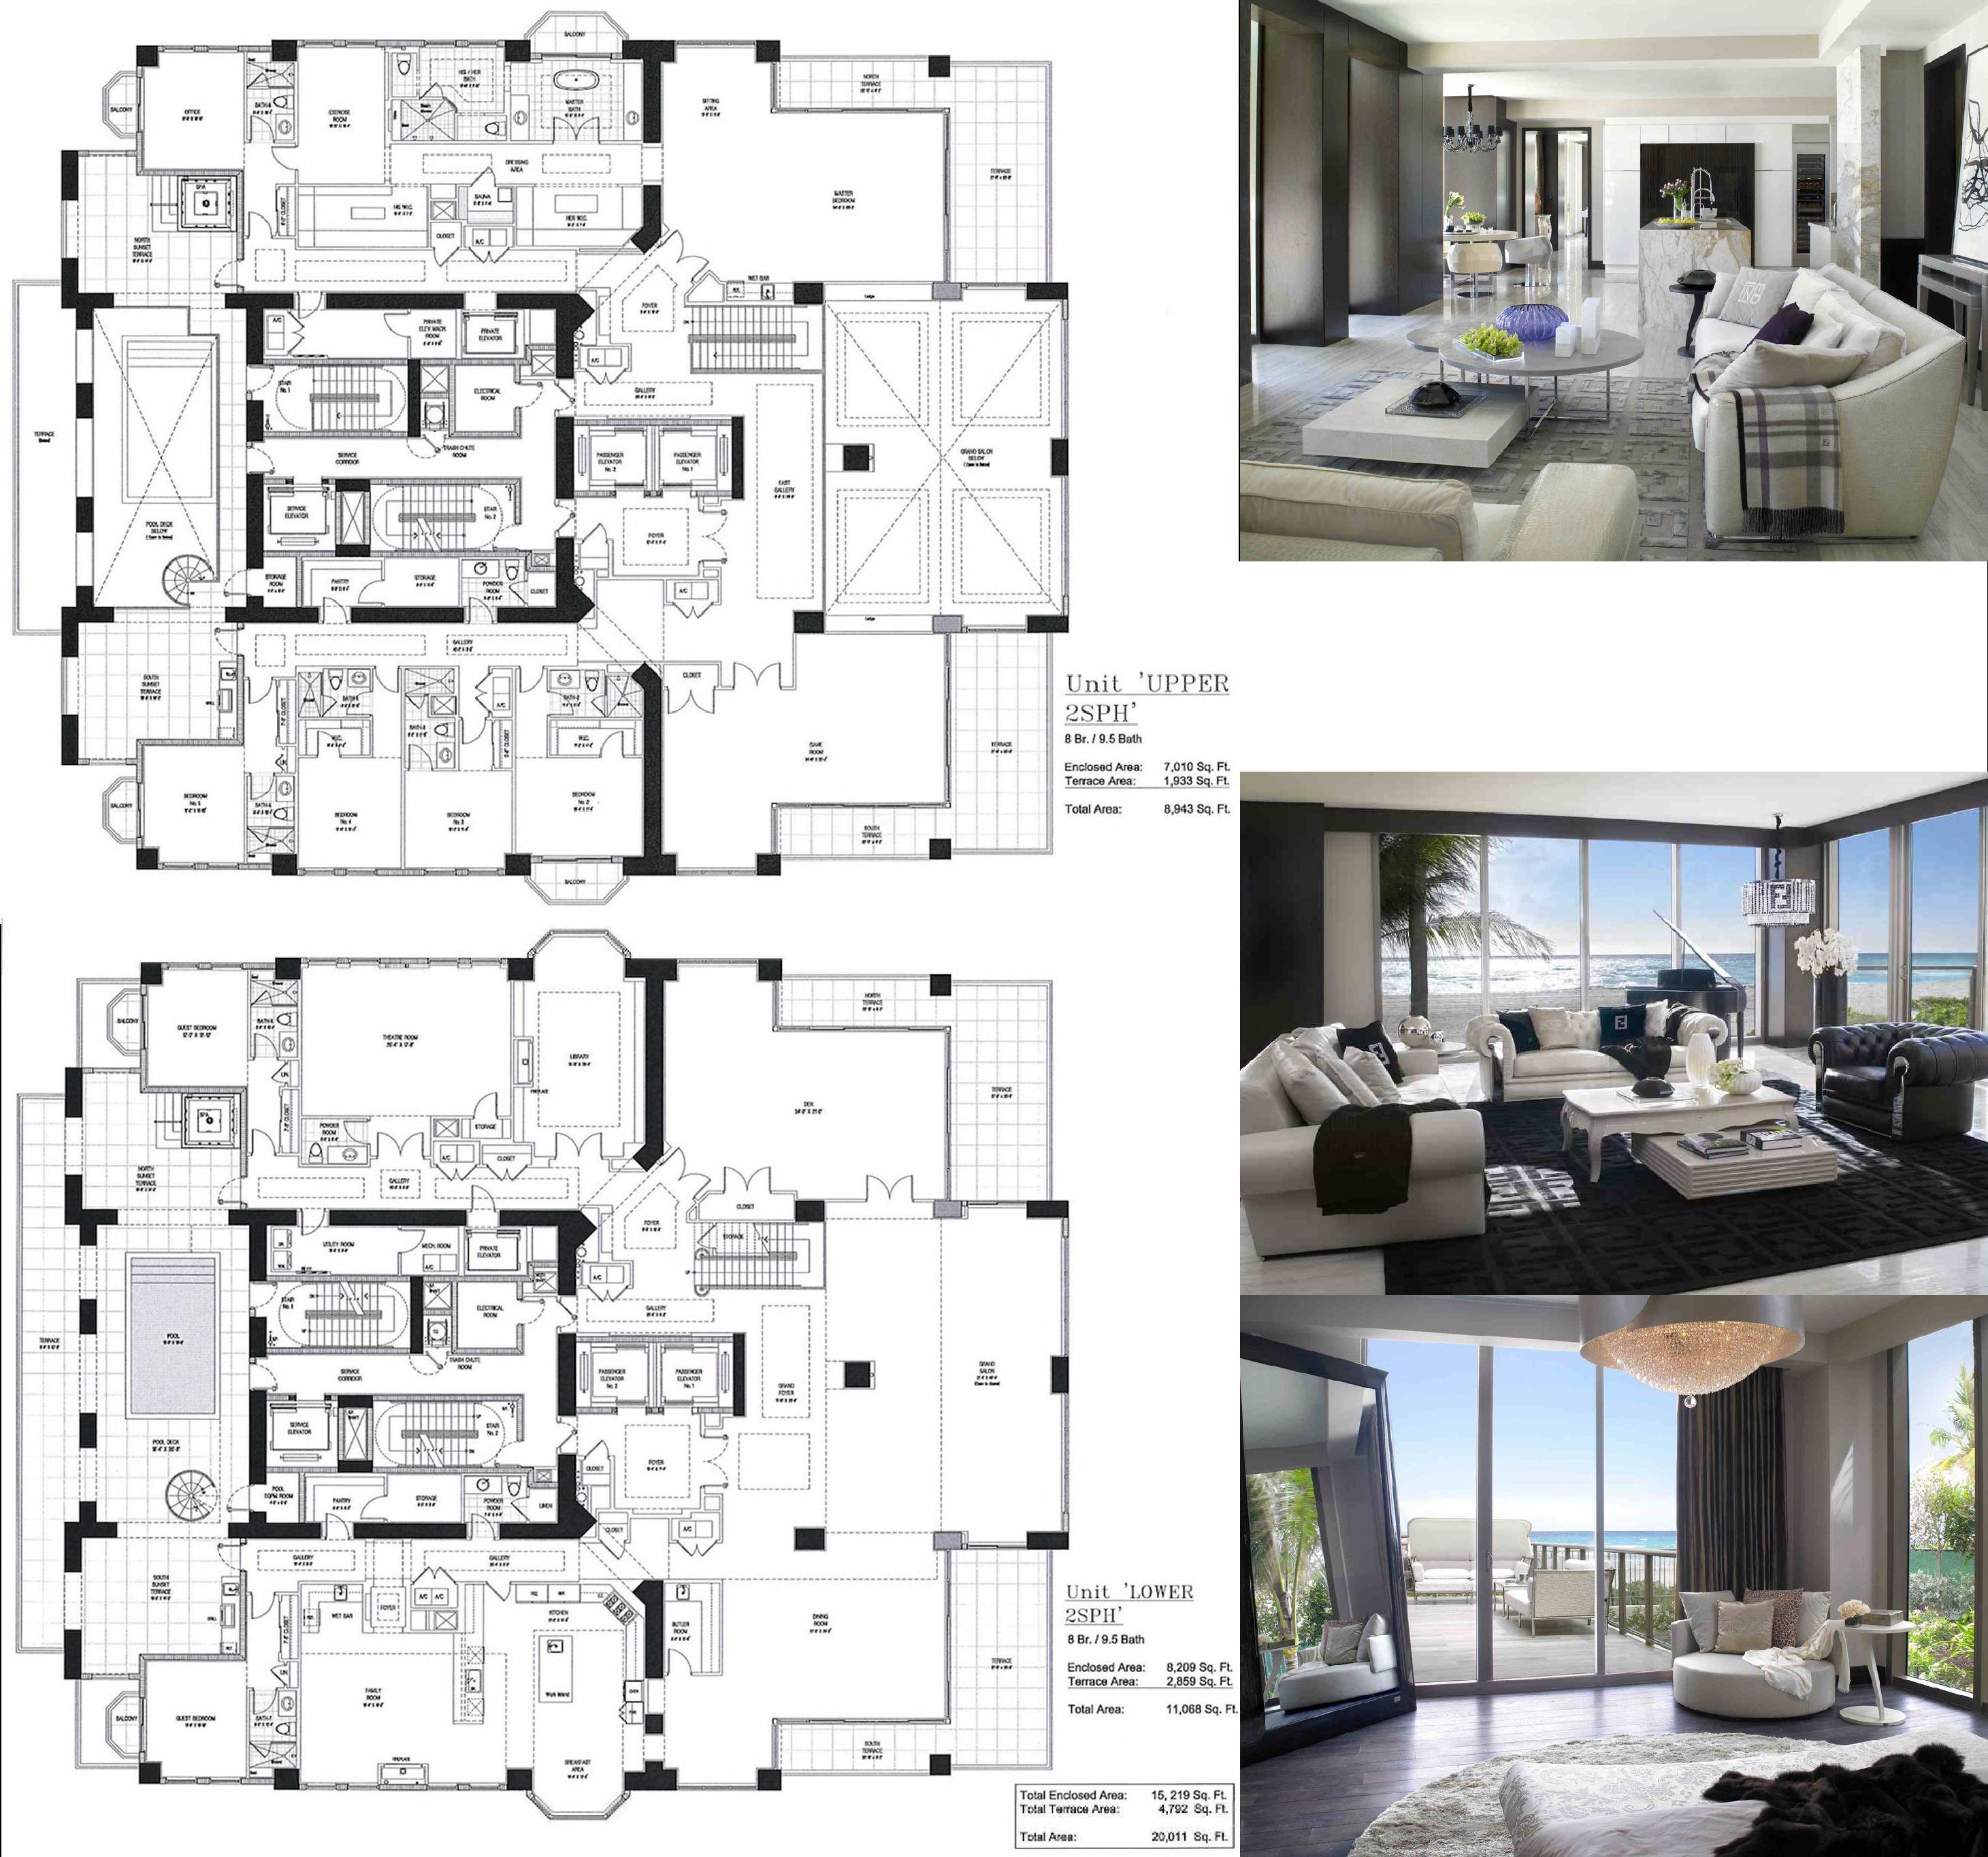 Here S The Floorplan To Florida S Future Priciest Penthouse Condo Floor Plans Floor Plans House Blueprints